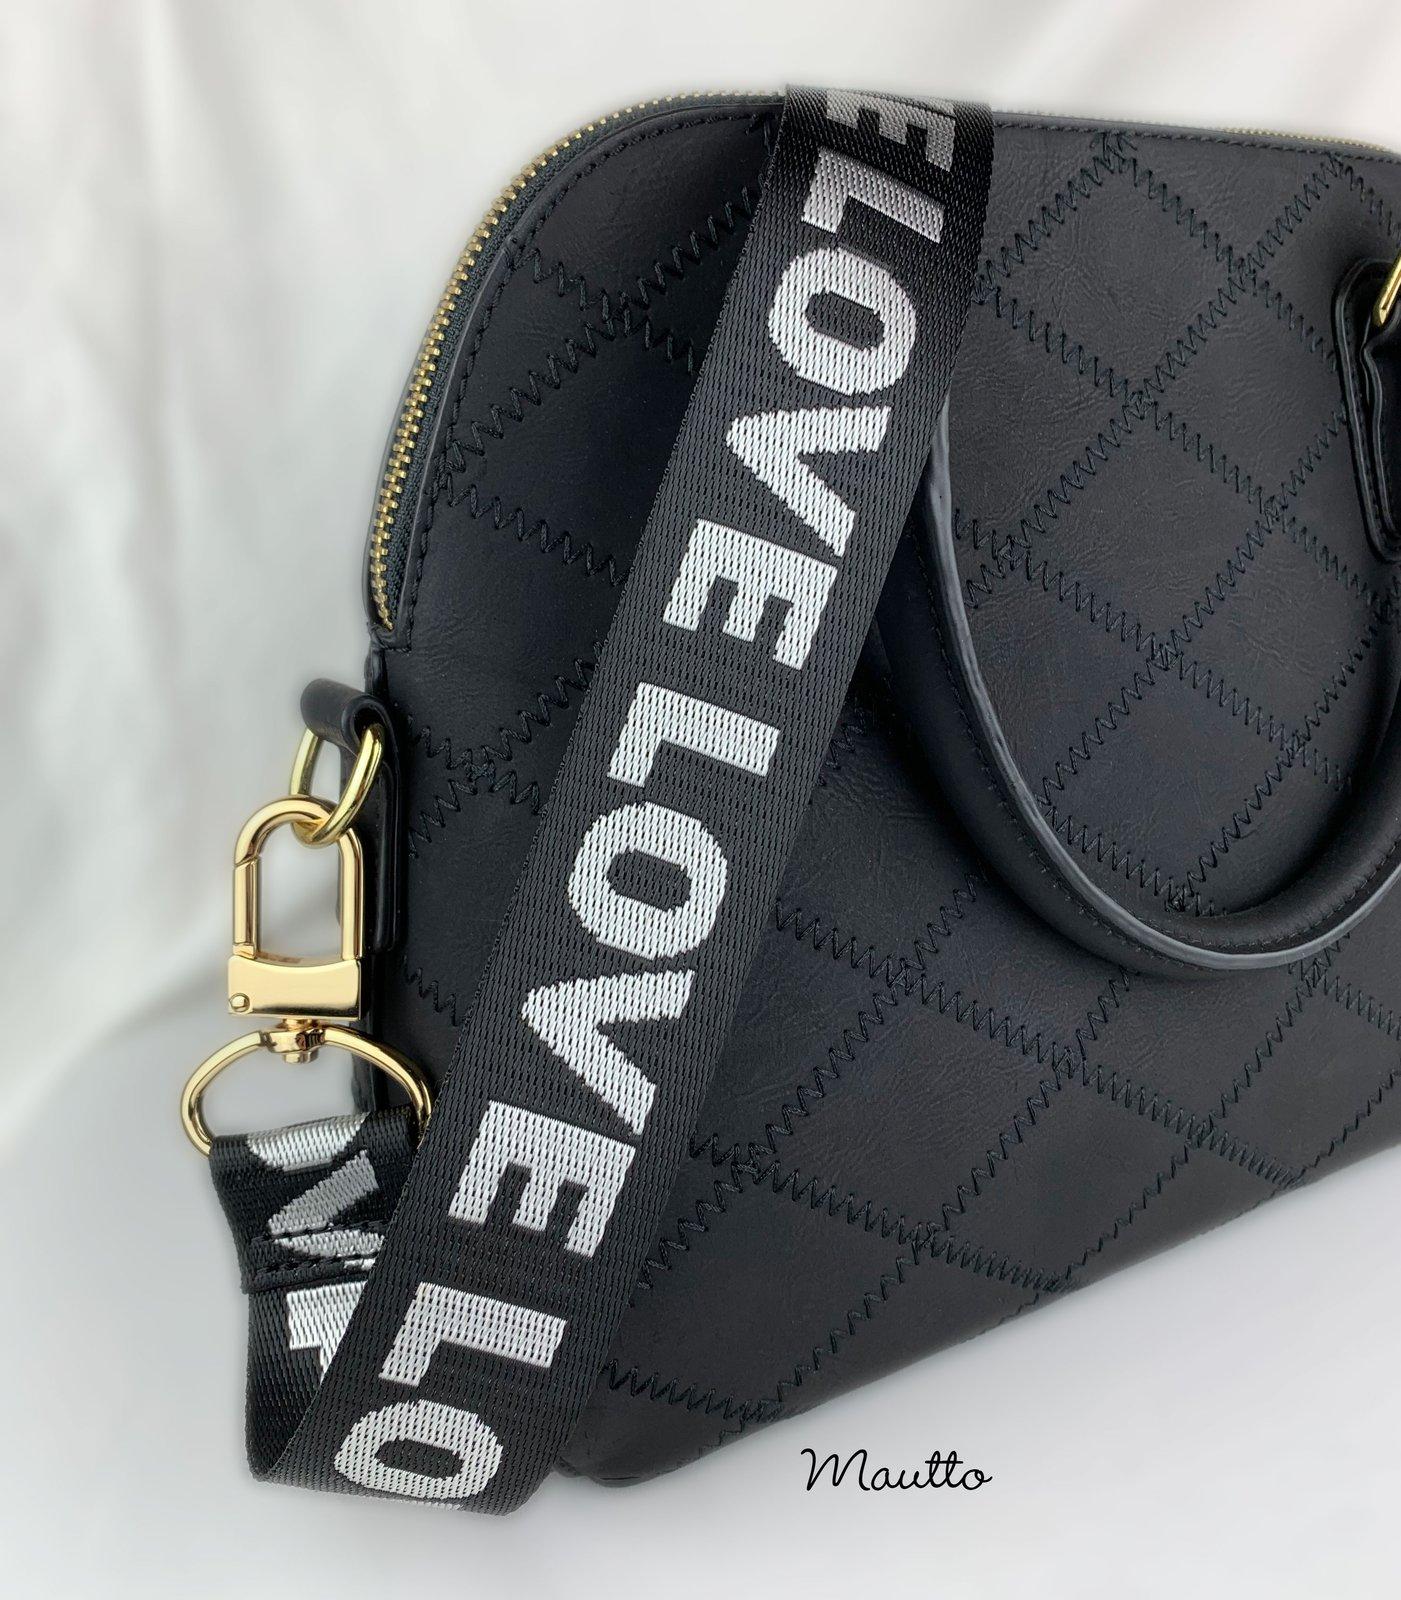 Purse Chain Strap Handle Adjusting Buckle Shoulder Crossbody Handbag Bag Metal